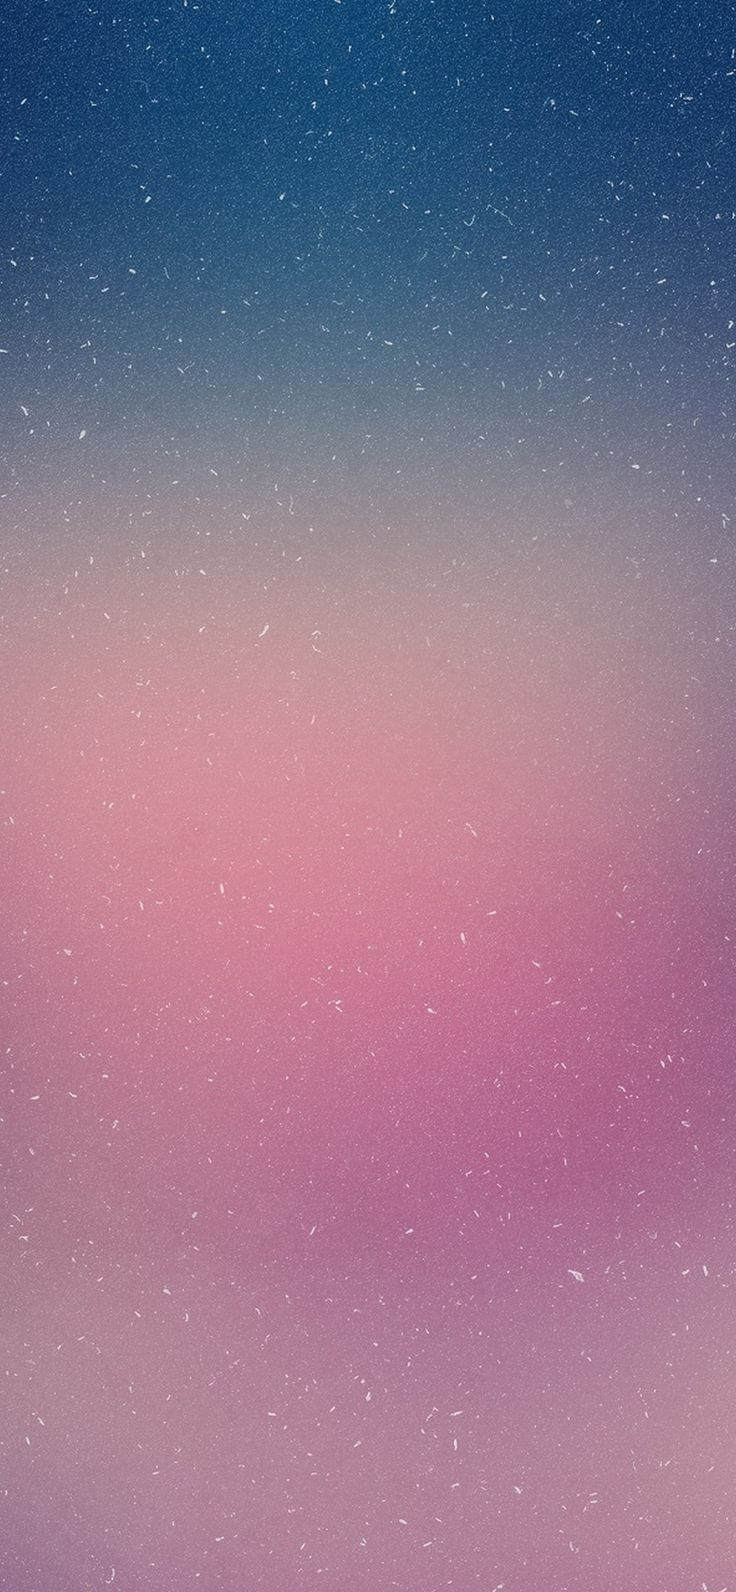 Iphone Xr Blur Vol 1 Wallpaper Best Papel De Parede De Fundo Papeis De Parede Para Iphone Planos De Fundo